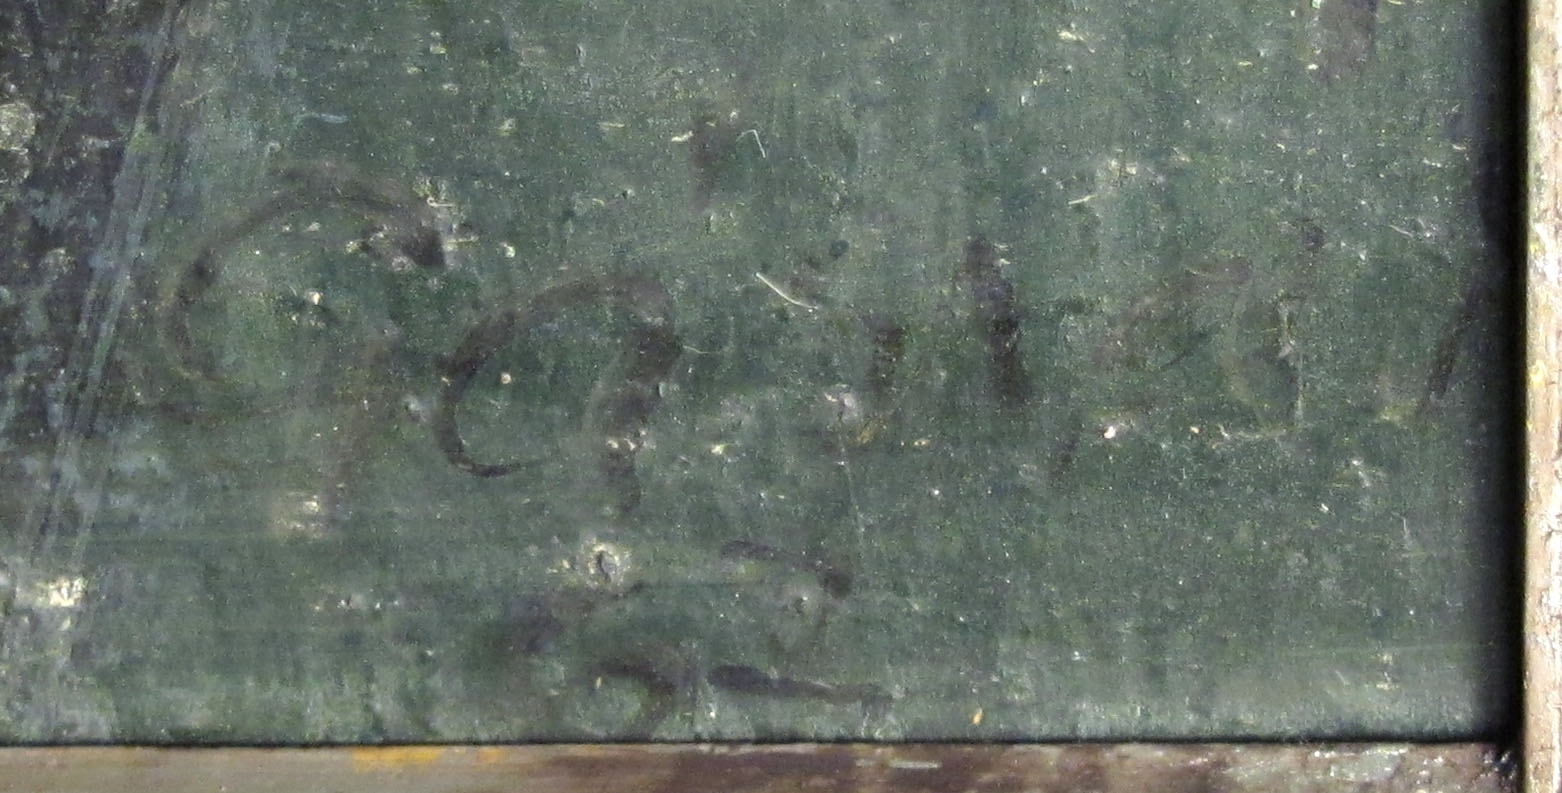 5-7s.jpg (1562�793)